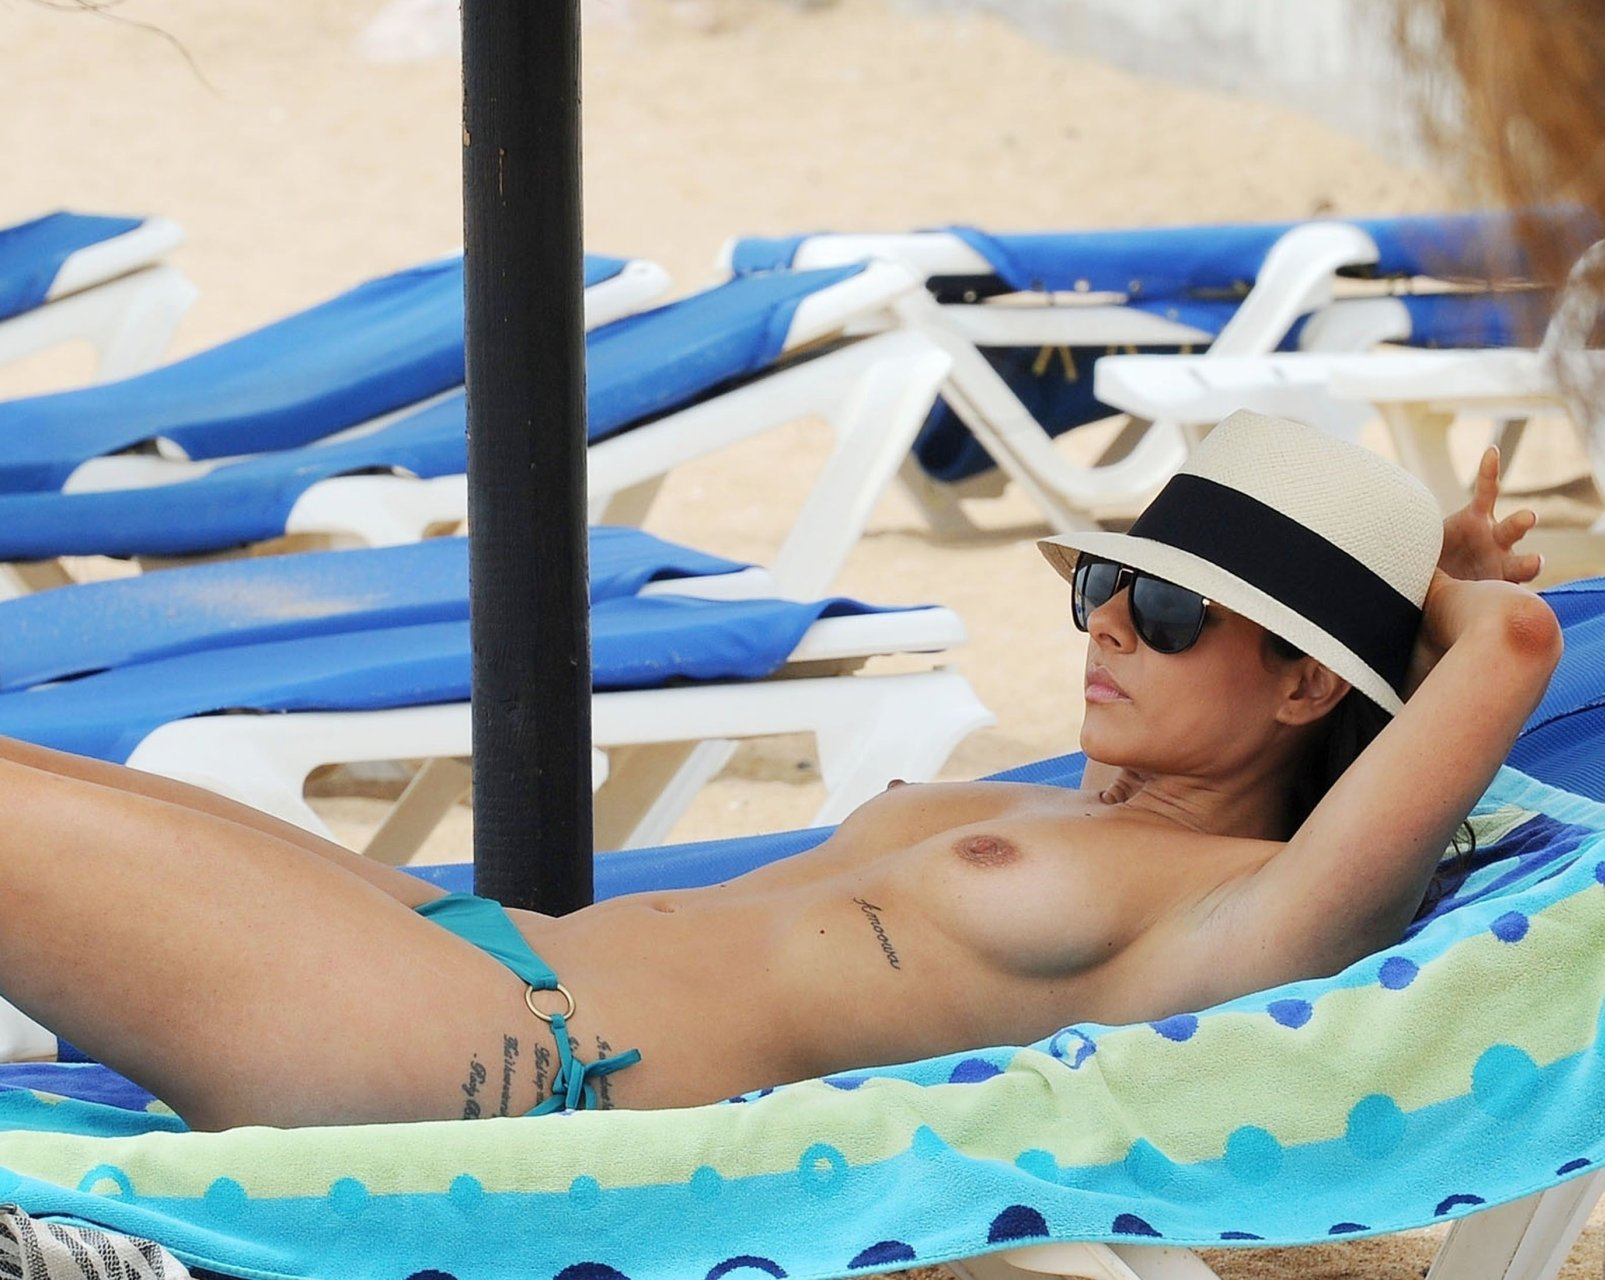 Roxanne pallett nude suggest you